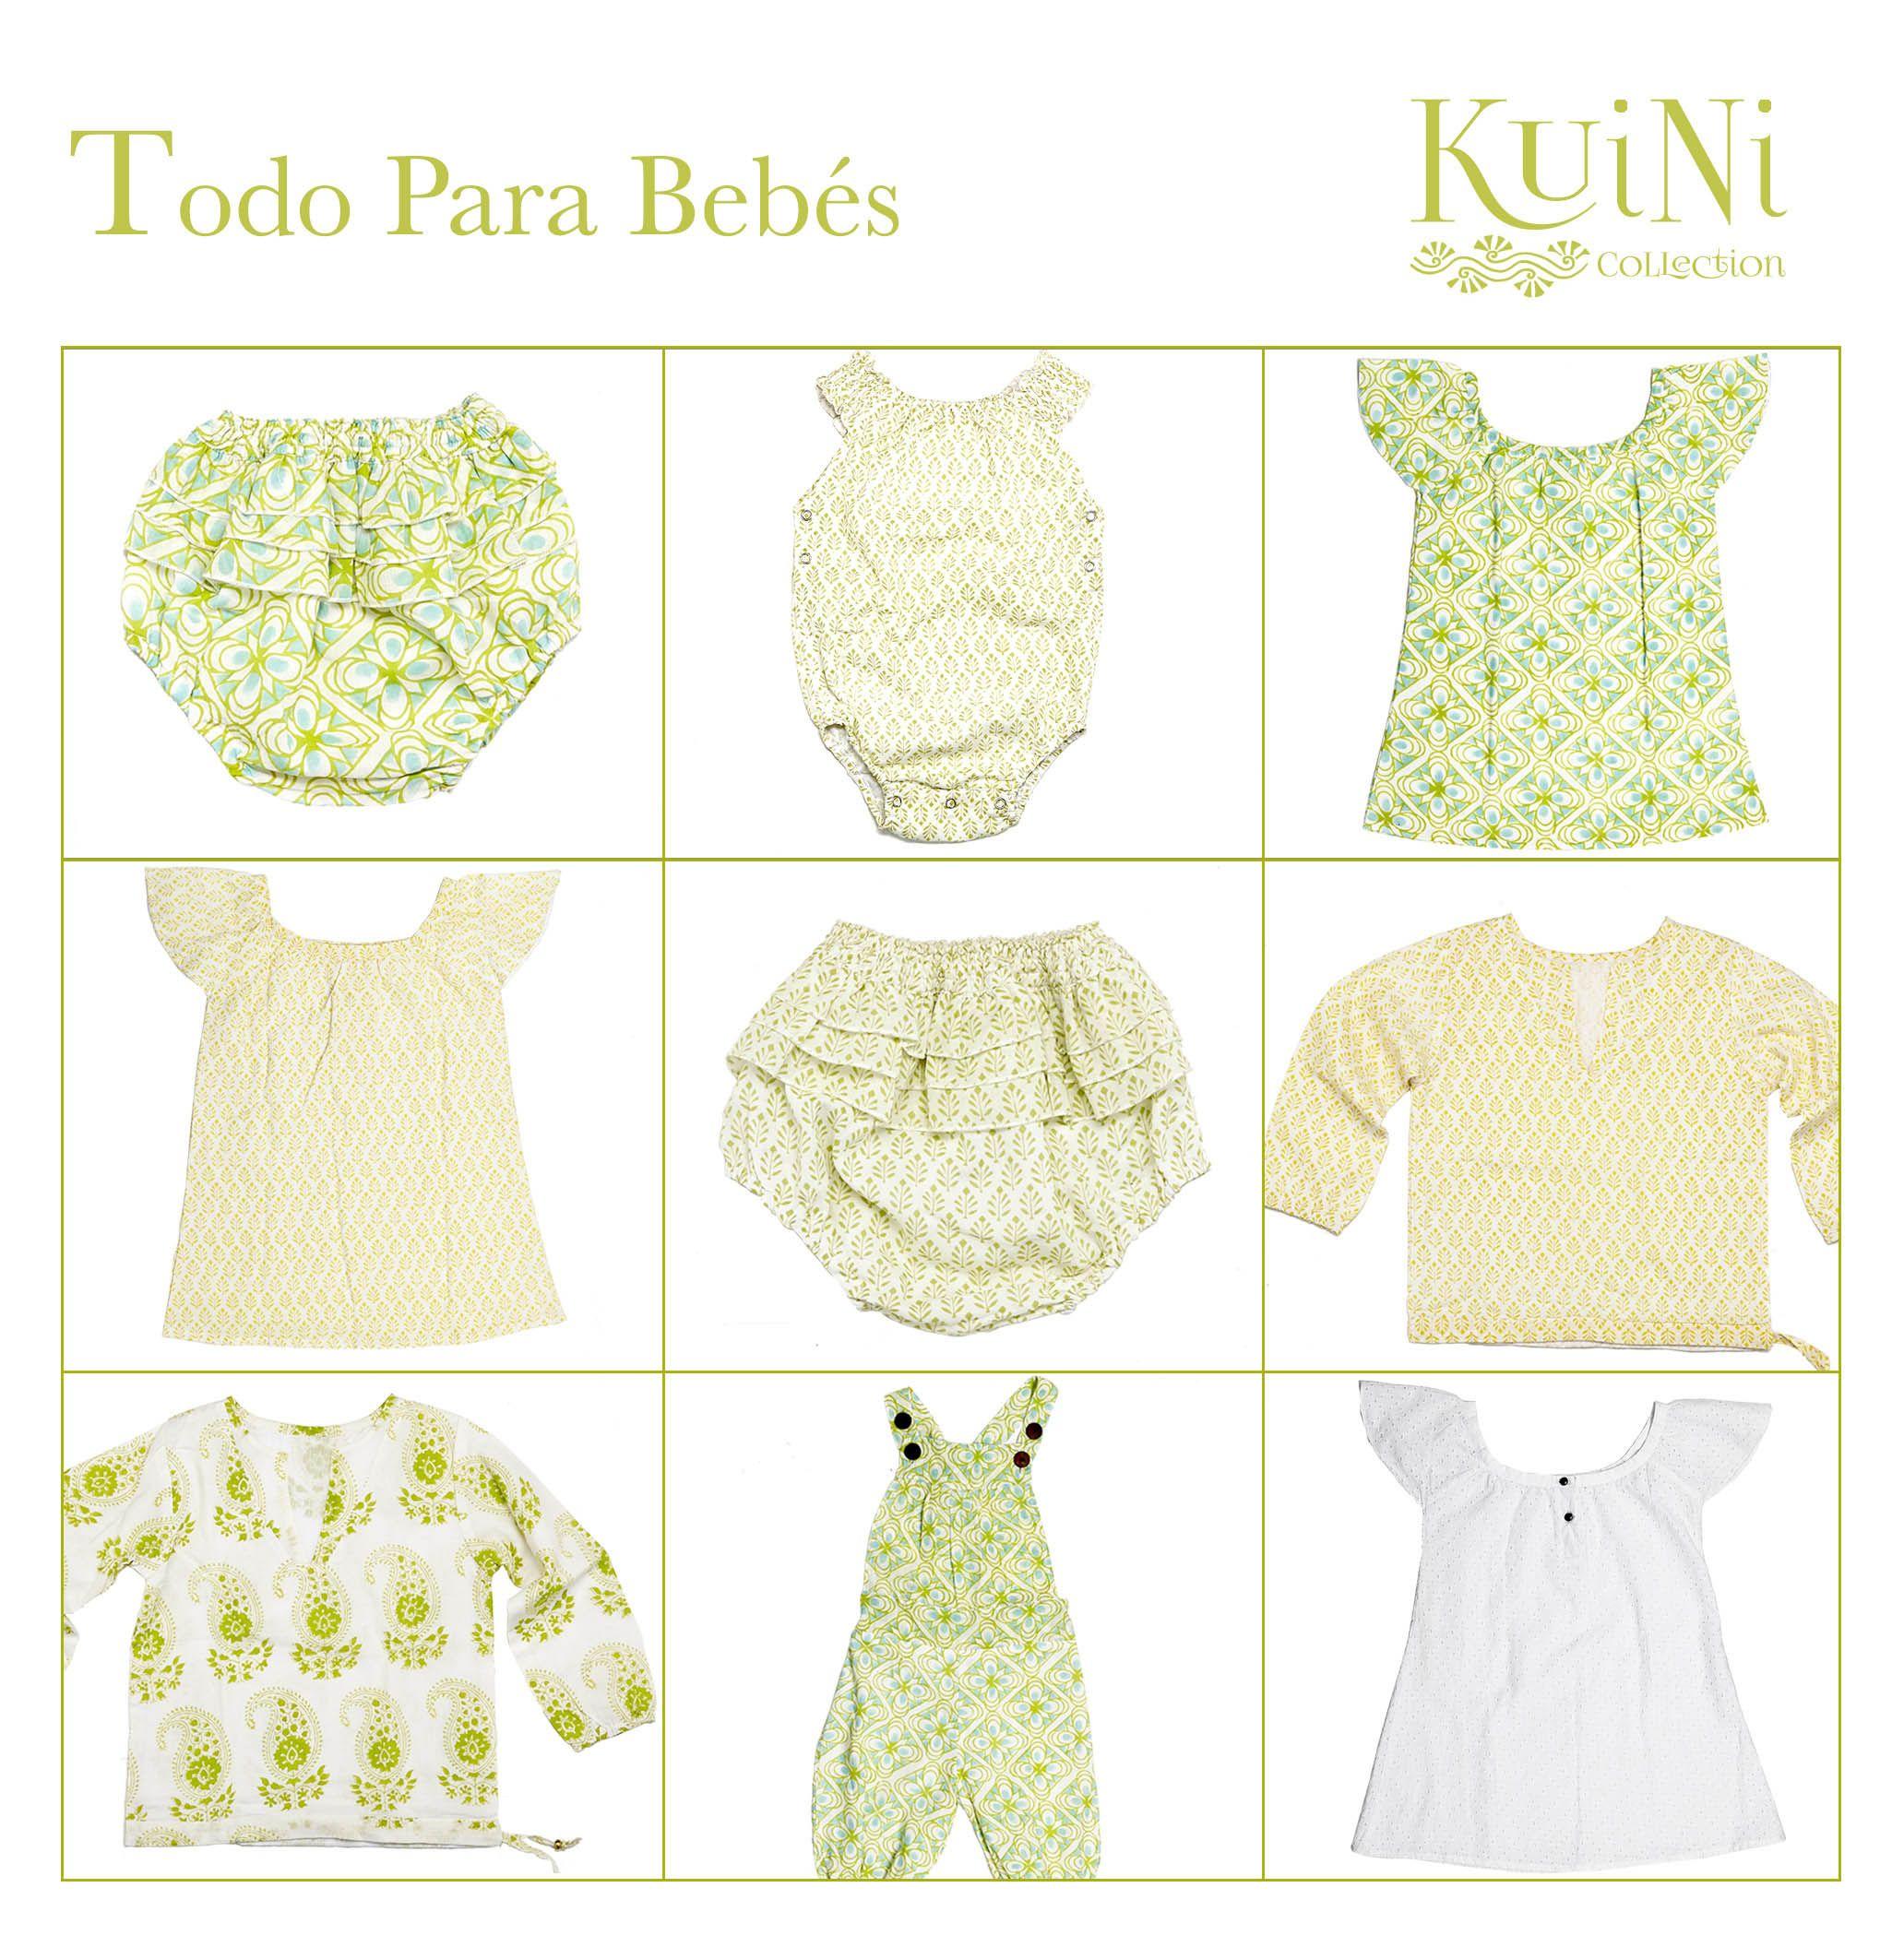 Todo para bebés… Kuini Collection